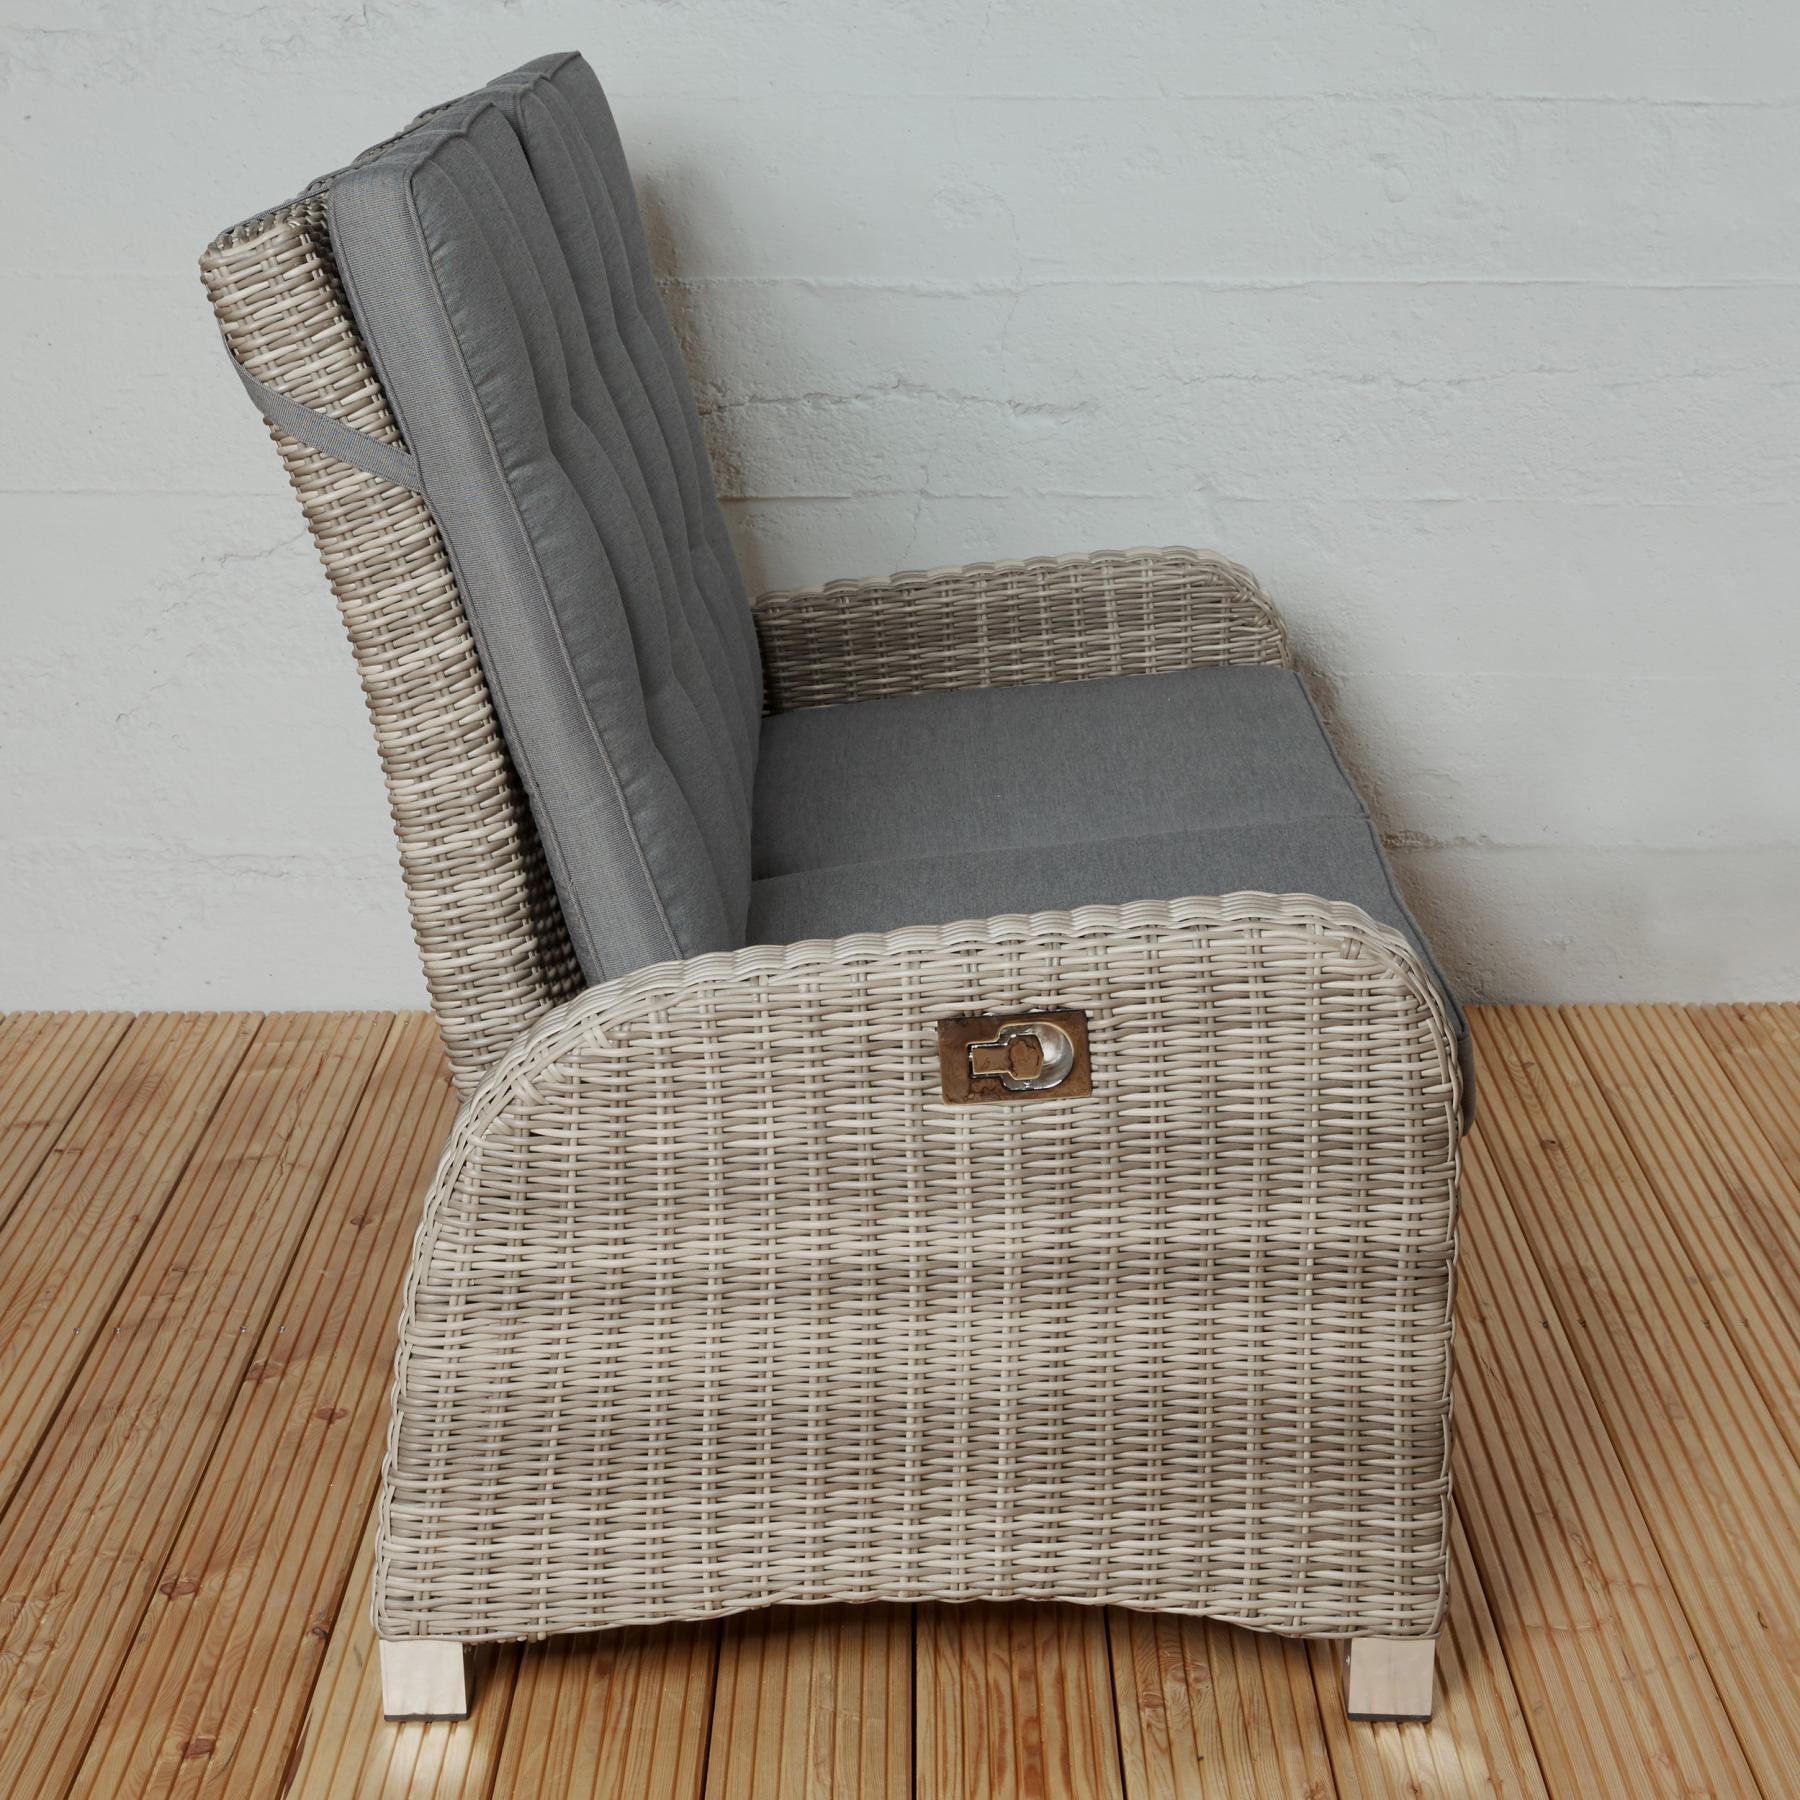 2 sitzer gartensofa rabida champagner loungesofa sofa. Black Bedroom Furniture Sets. Home Design Ideas